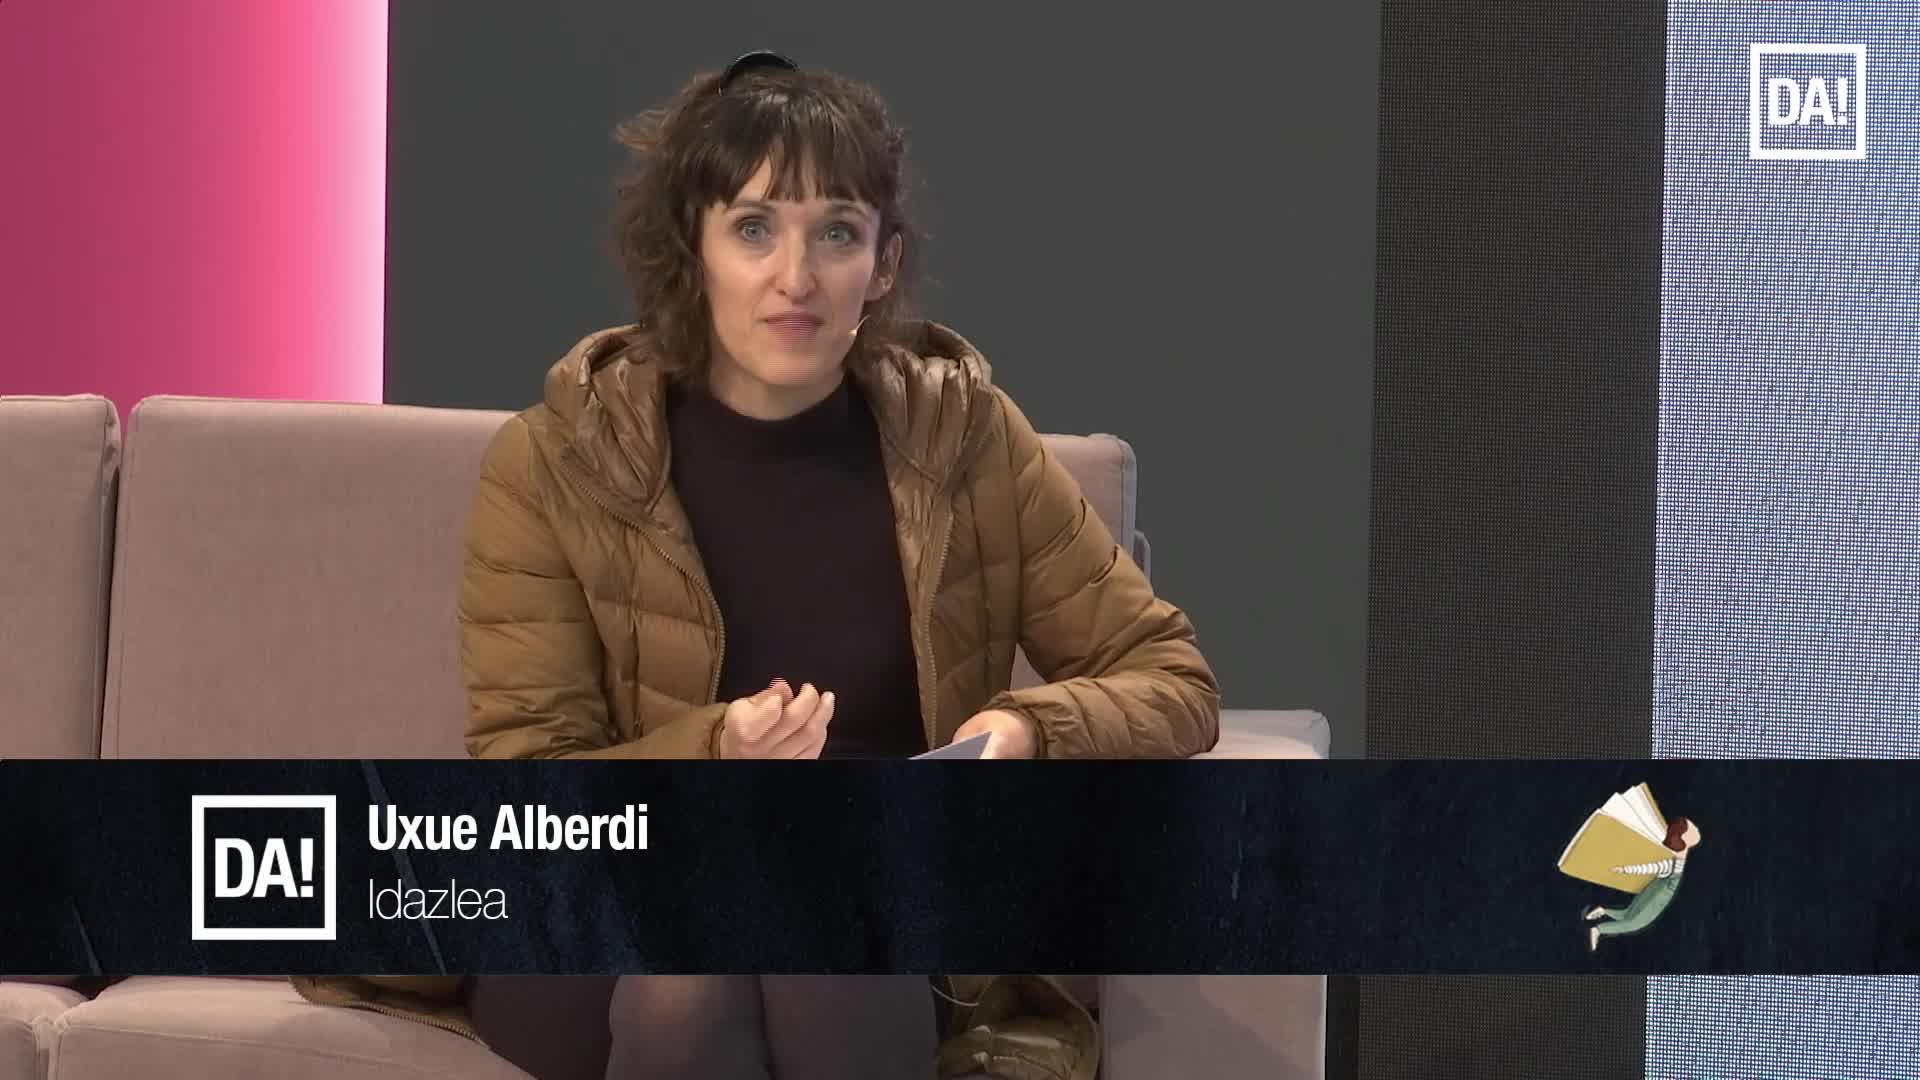 Uxue Alberdi